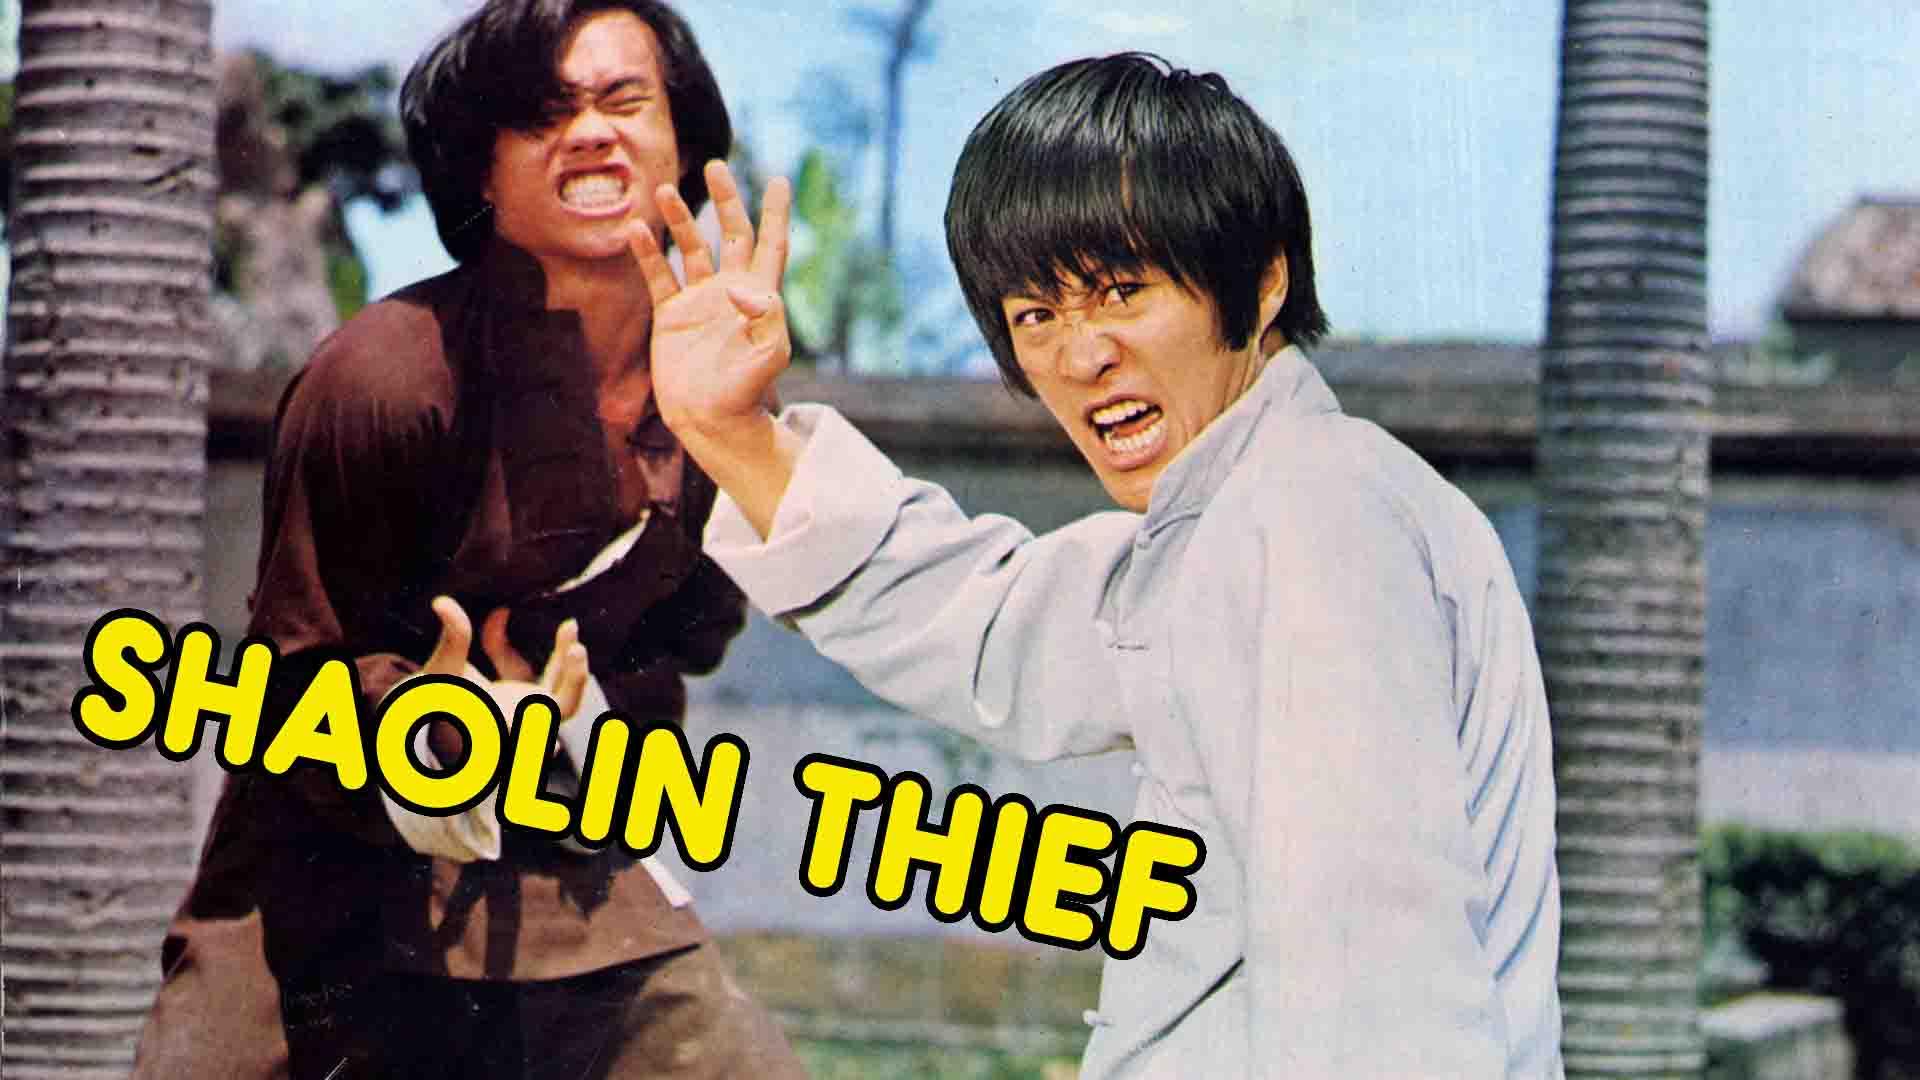 Shaolin Thief